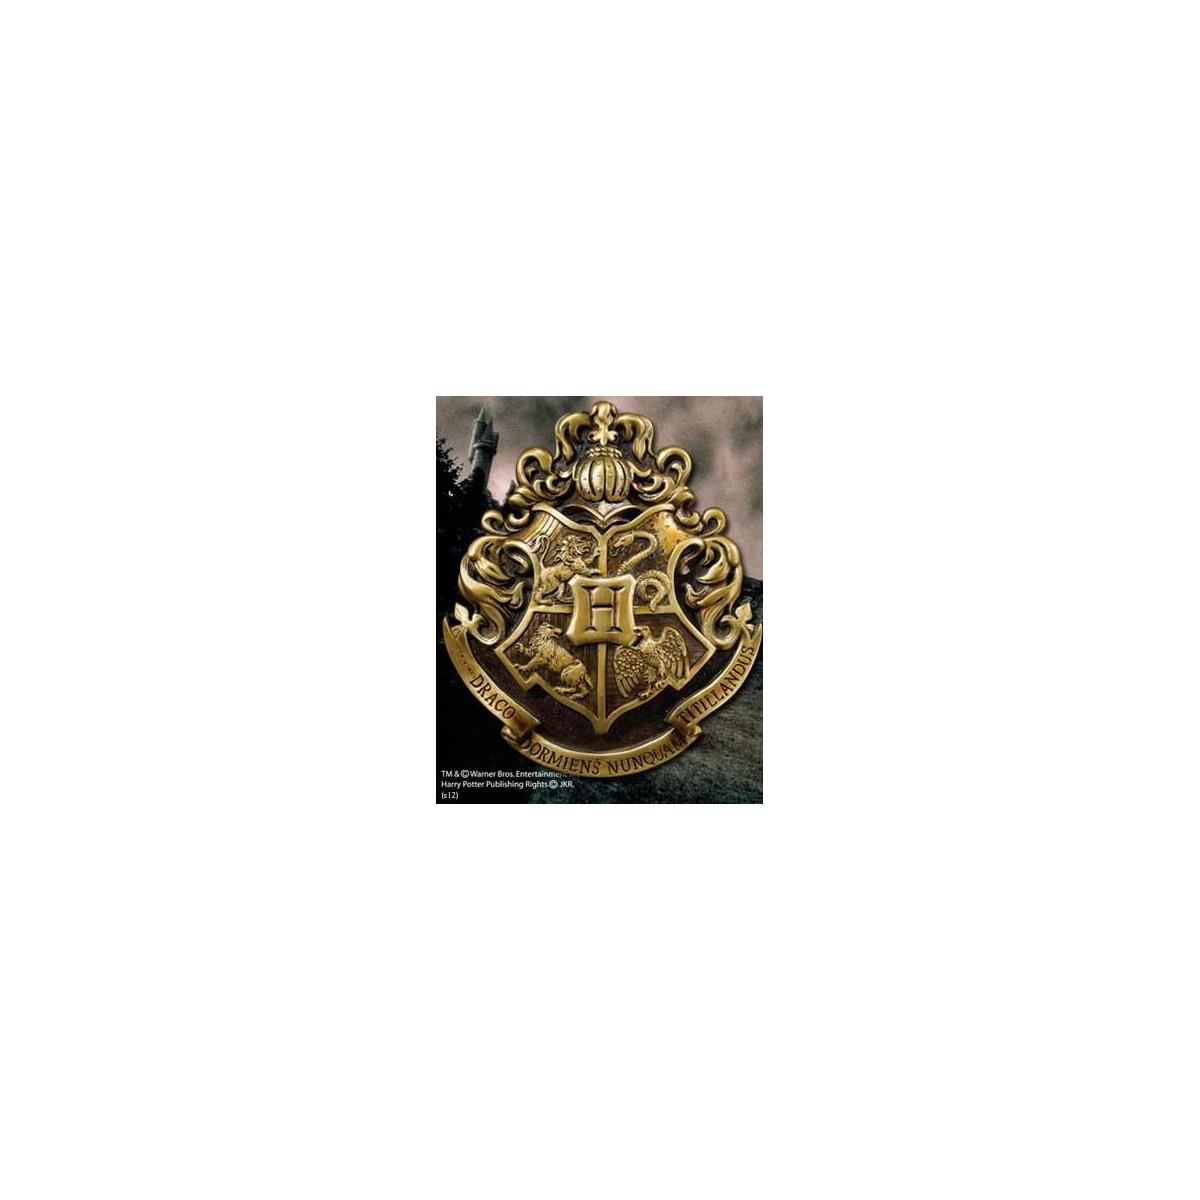 Harry potter d coration murale hogwarts school crest 28 for Decoration murale harry potter